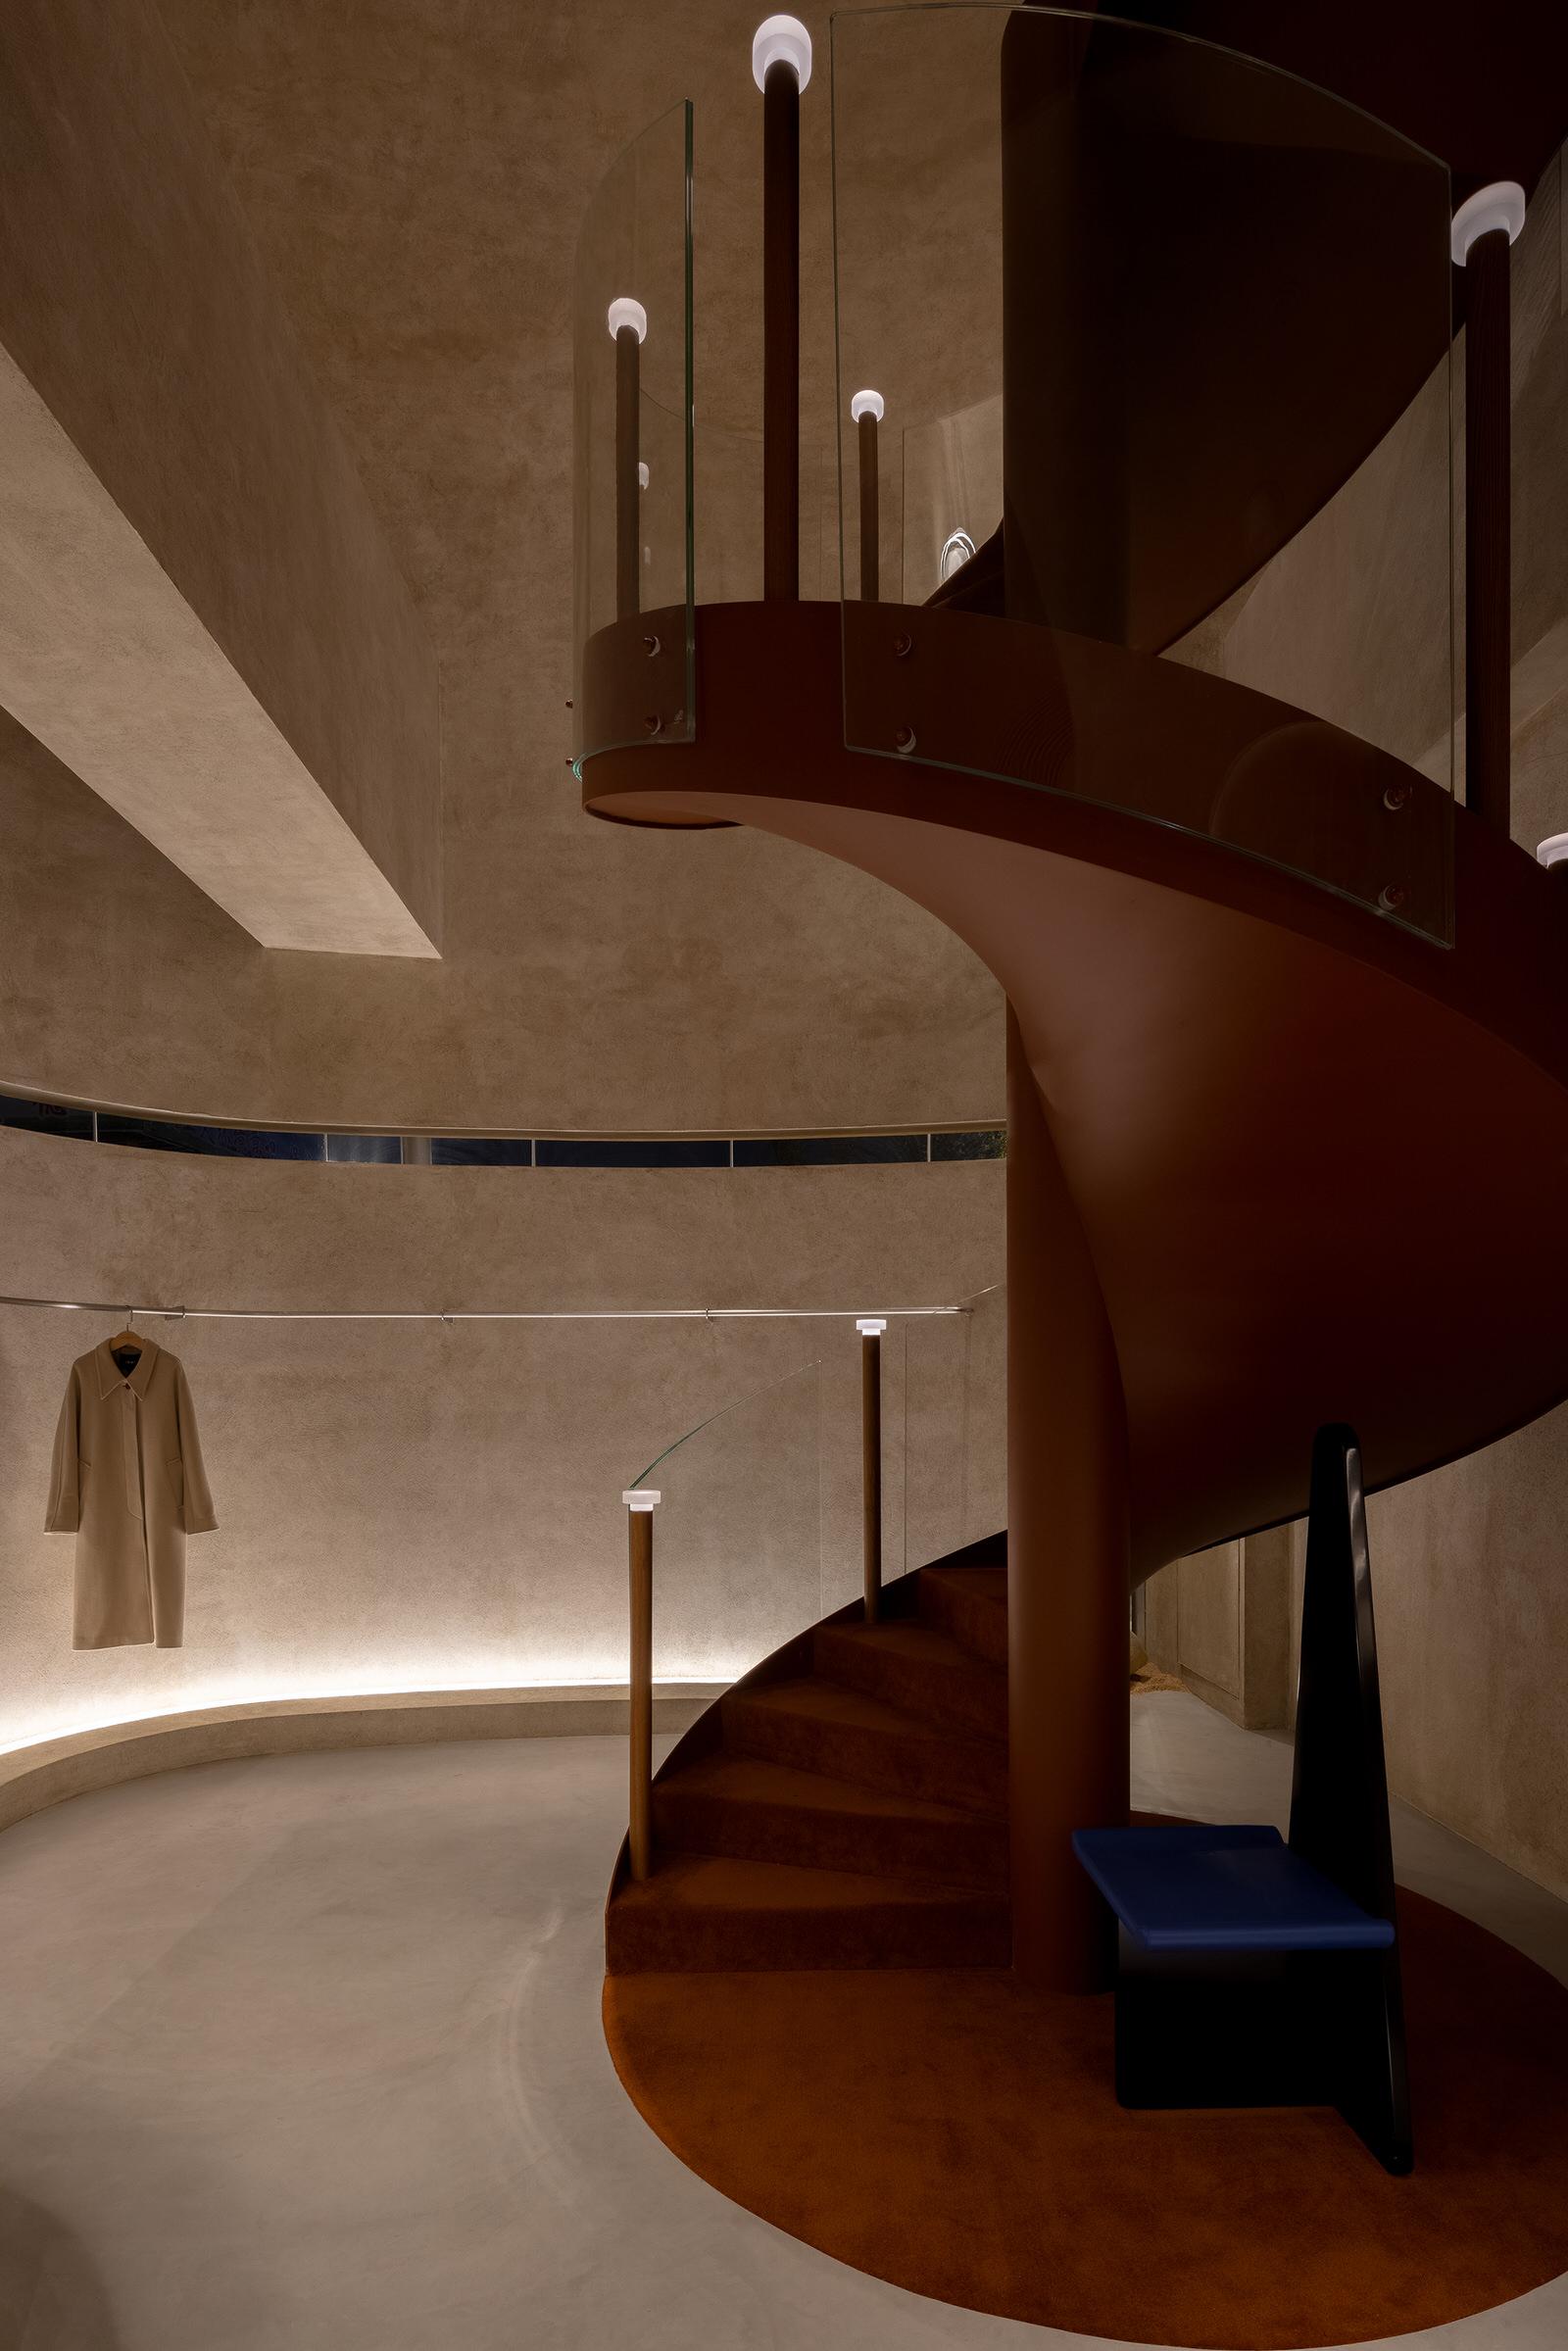 Liang Architecture Studio Audrey Boutique Hangzhou China Luxury Retail Photo Shao Feng Yellowtrace 30